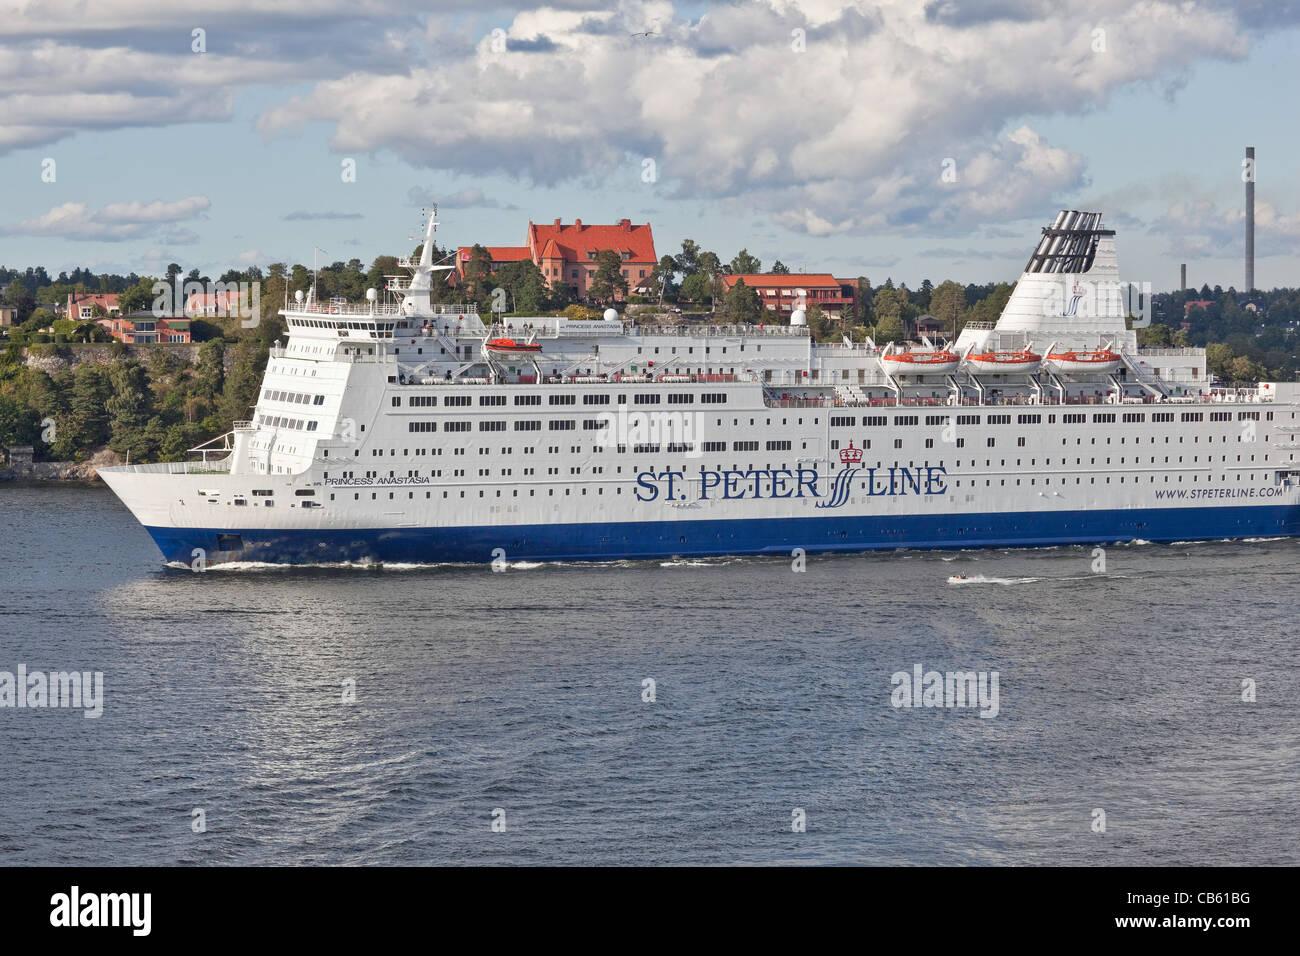 Cruise Boats in Stockholm Archipelago;Sweden;Scandinavia;Europe - Stock Image